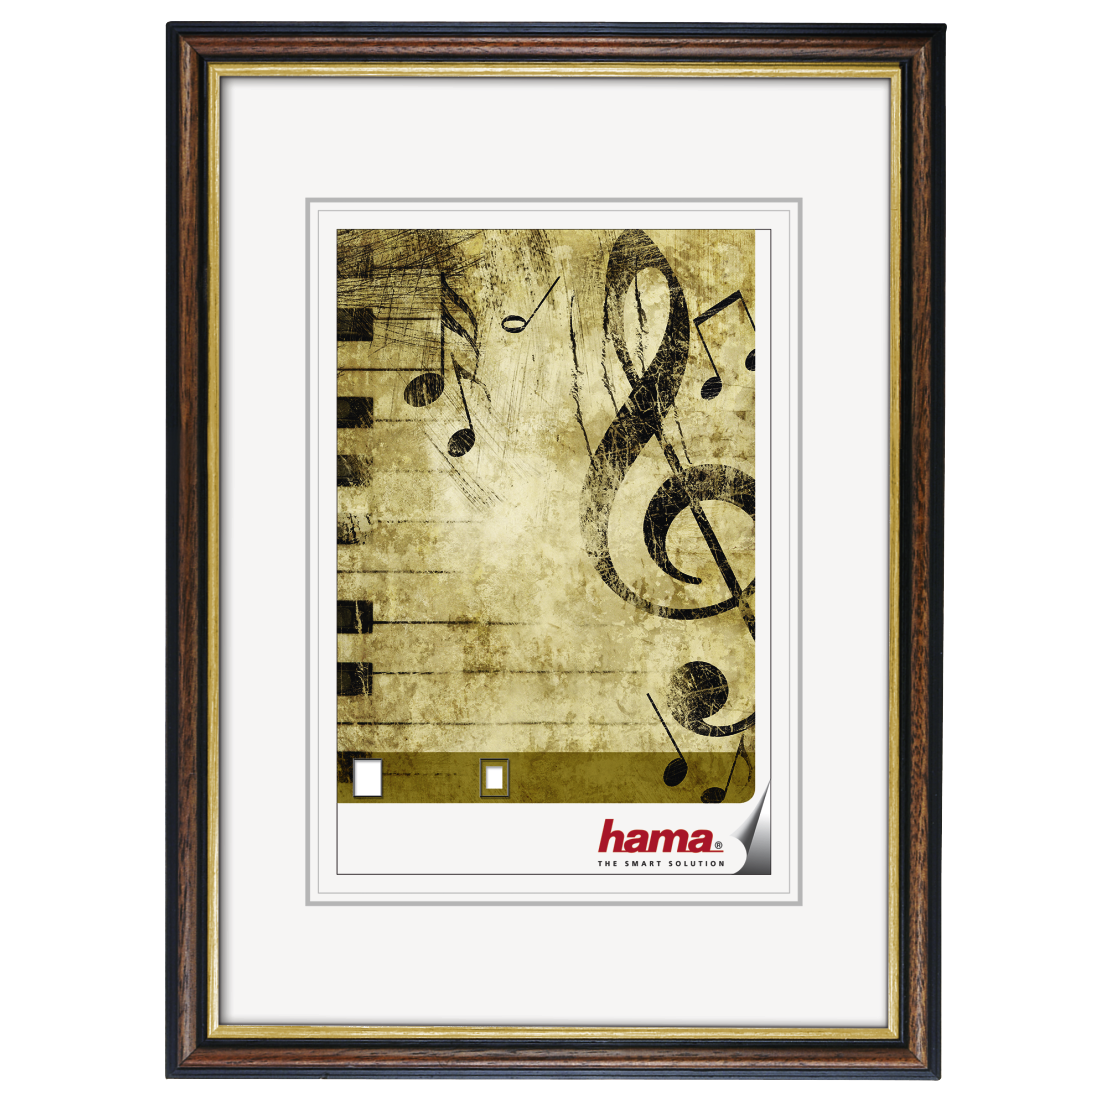 00065794 Hama Wooden Frame Idaho Brown 28 X 35 Cm Hama De